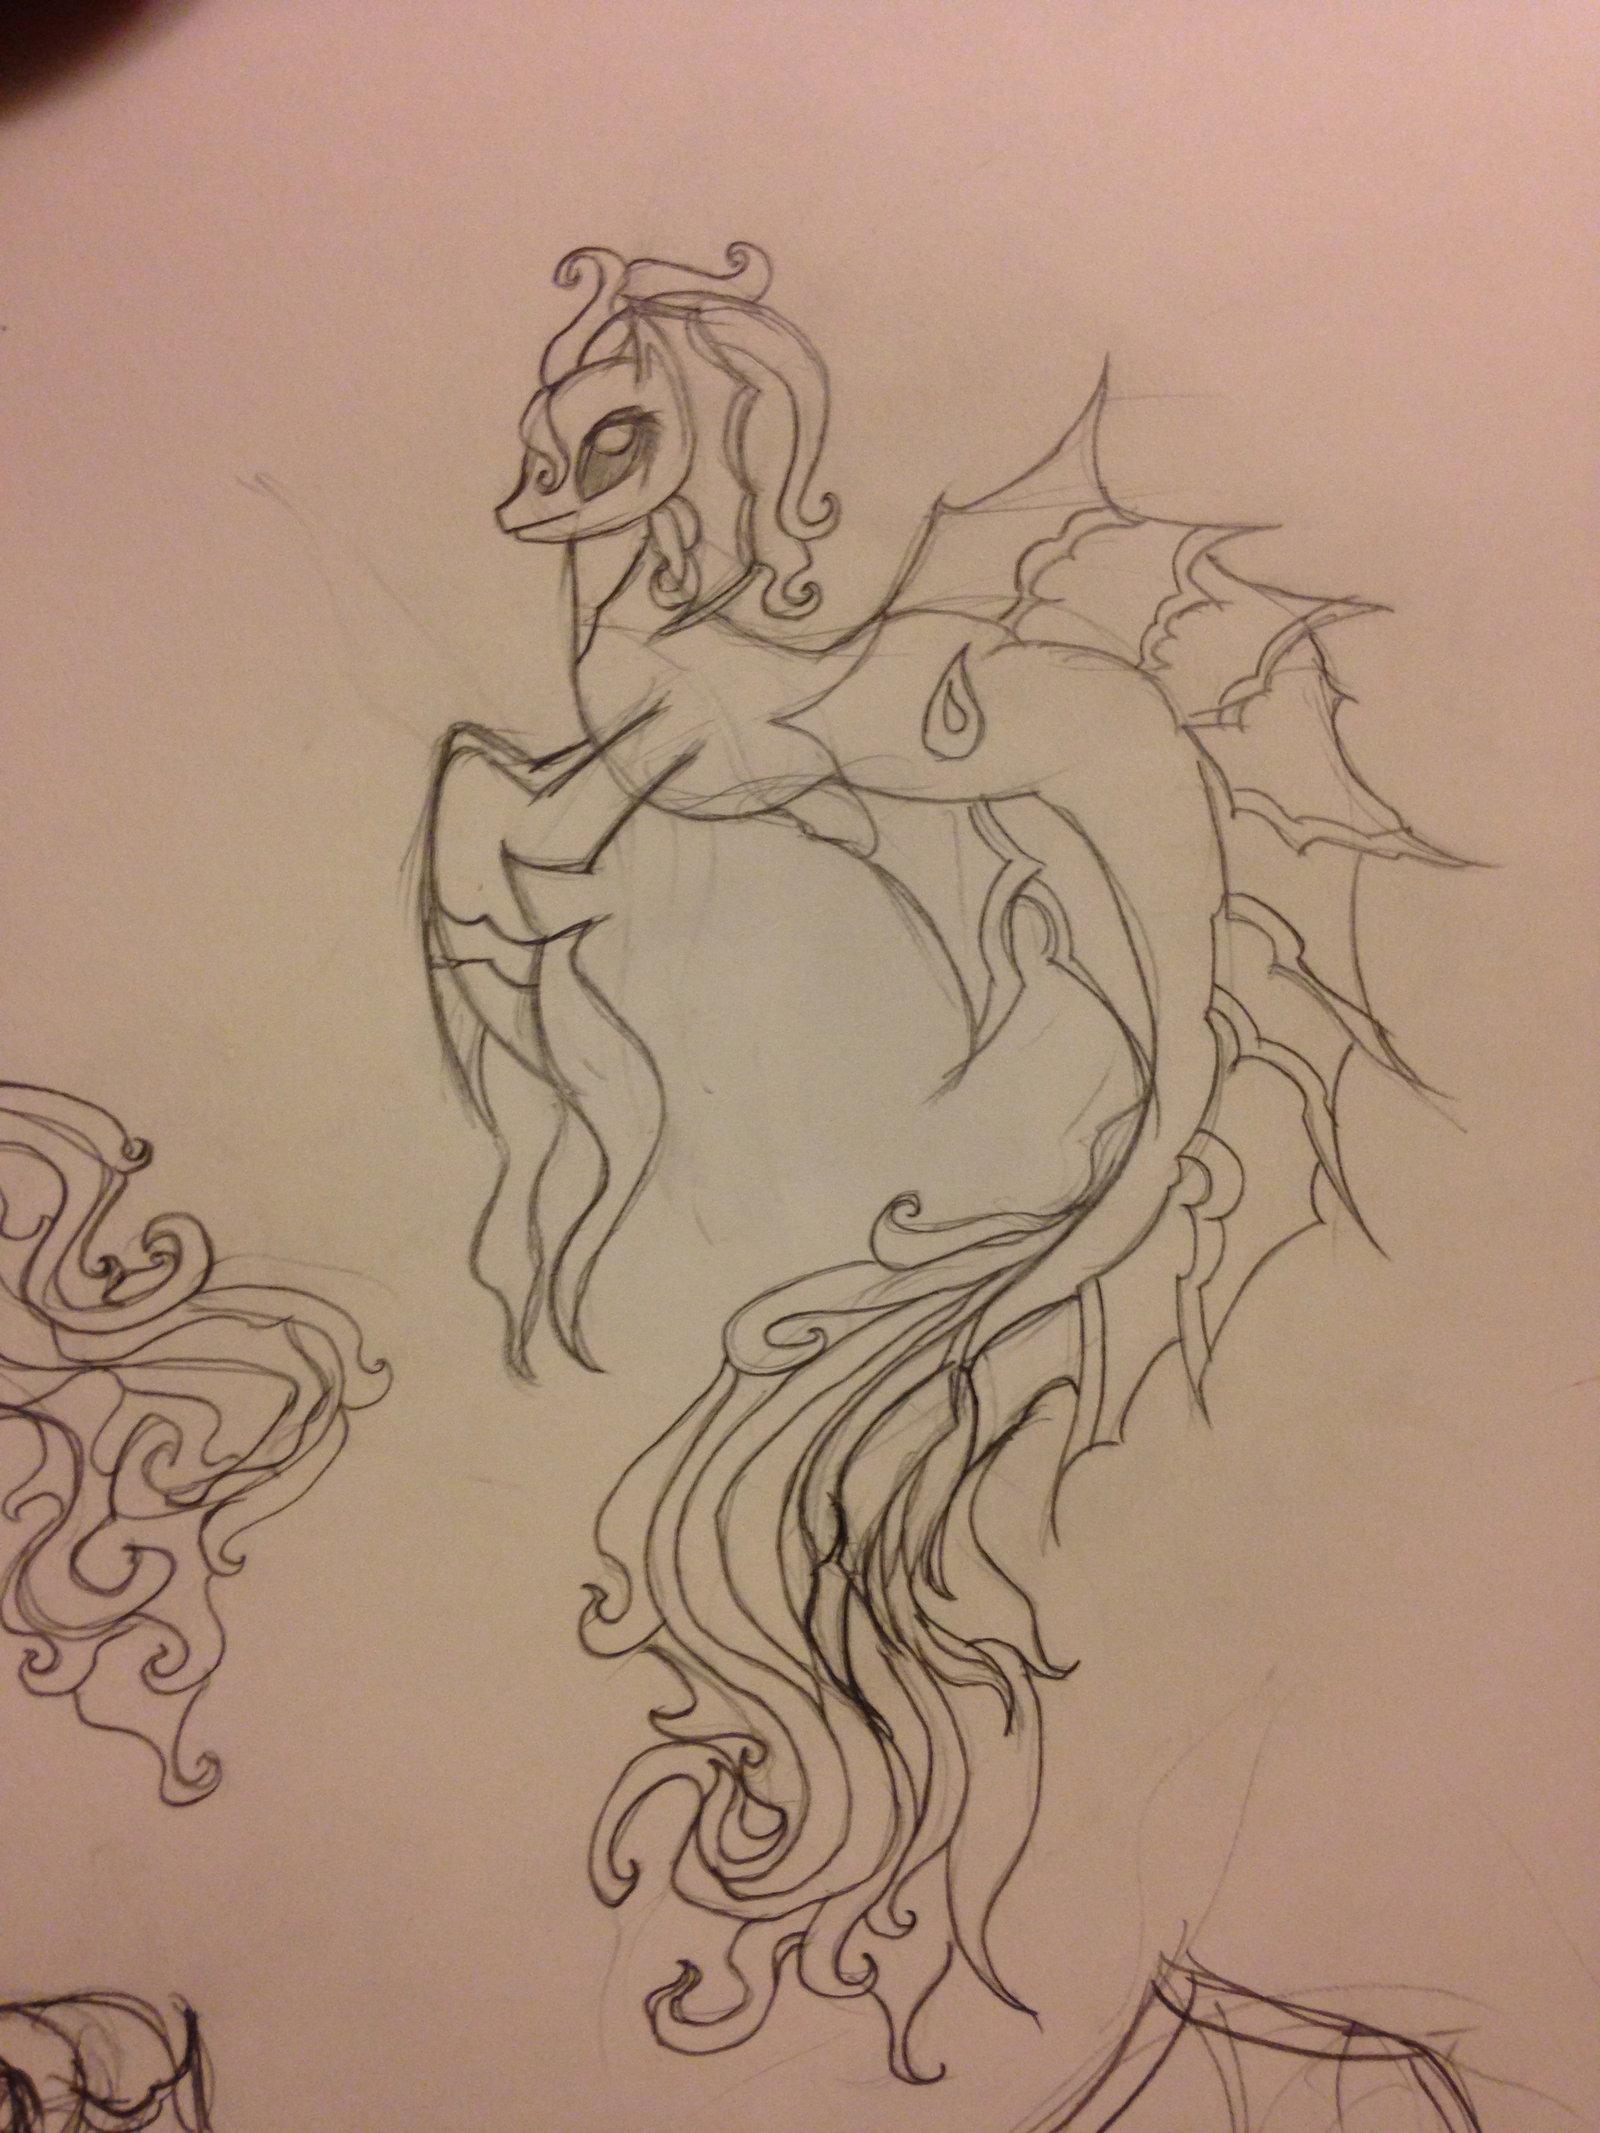 Drawn my little pony hippocampus DeviantArt form) My by Little